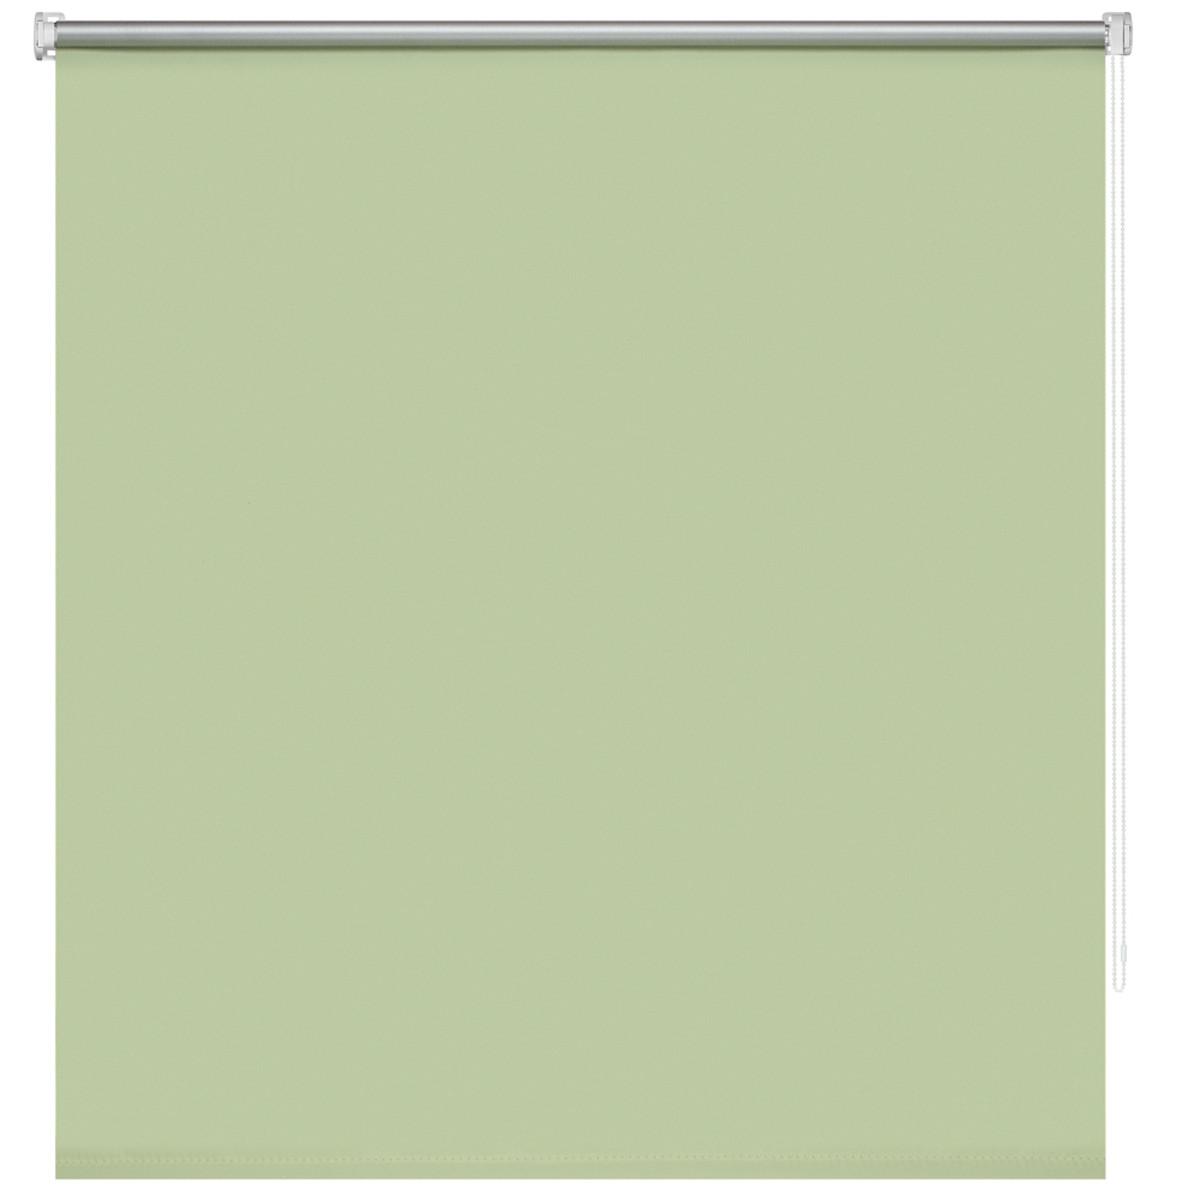 Рулонная Ора Decofest Плайн 100Х160 Цвет Зеленый